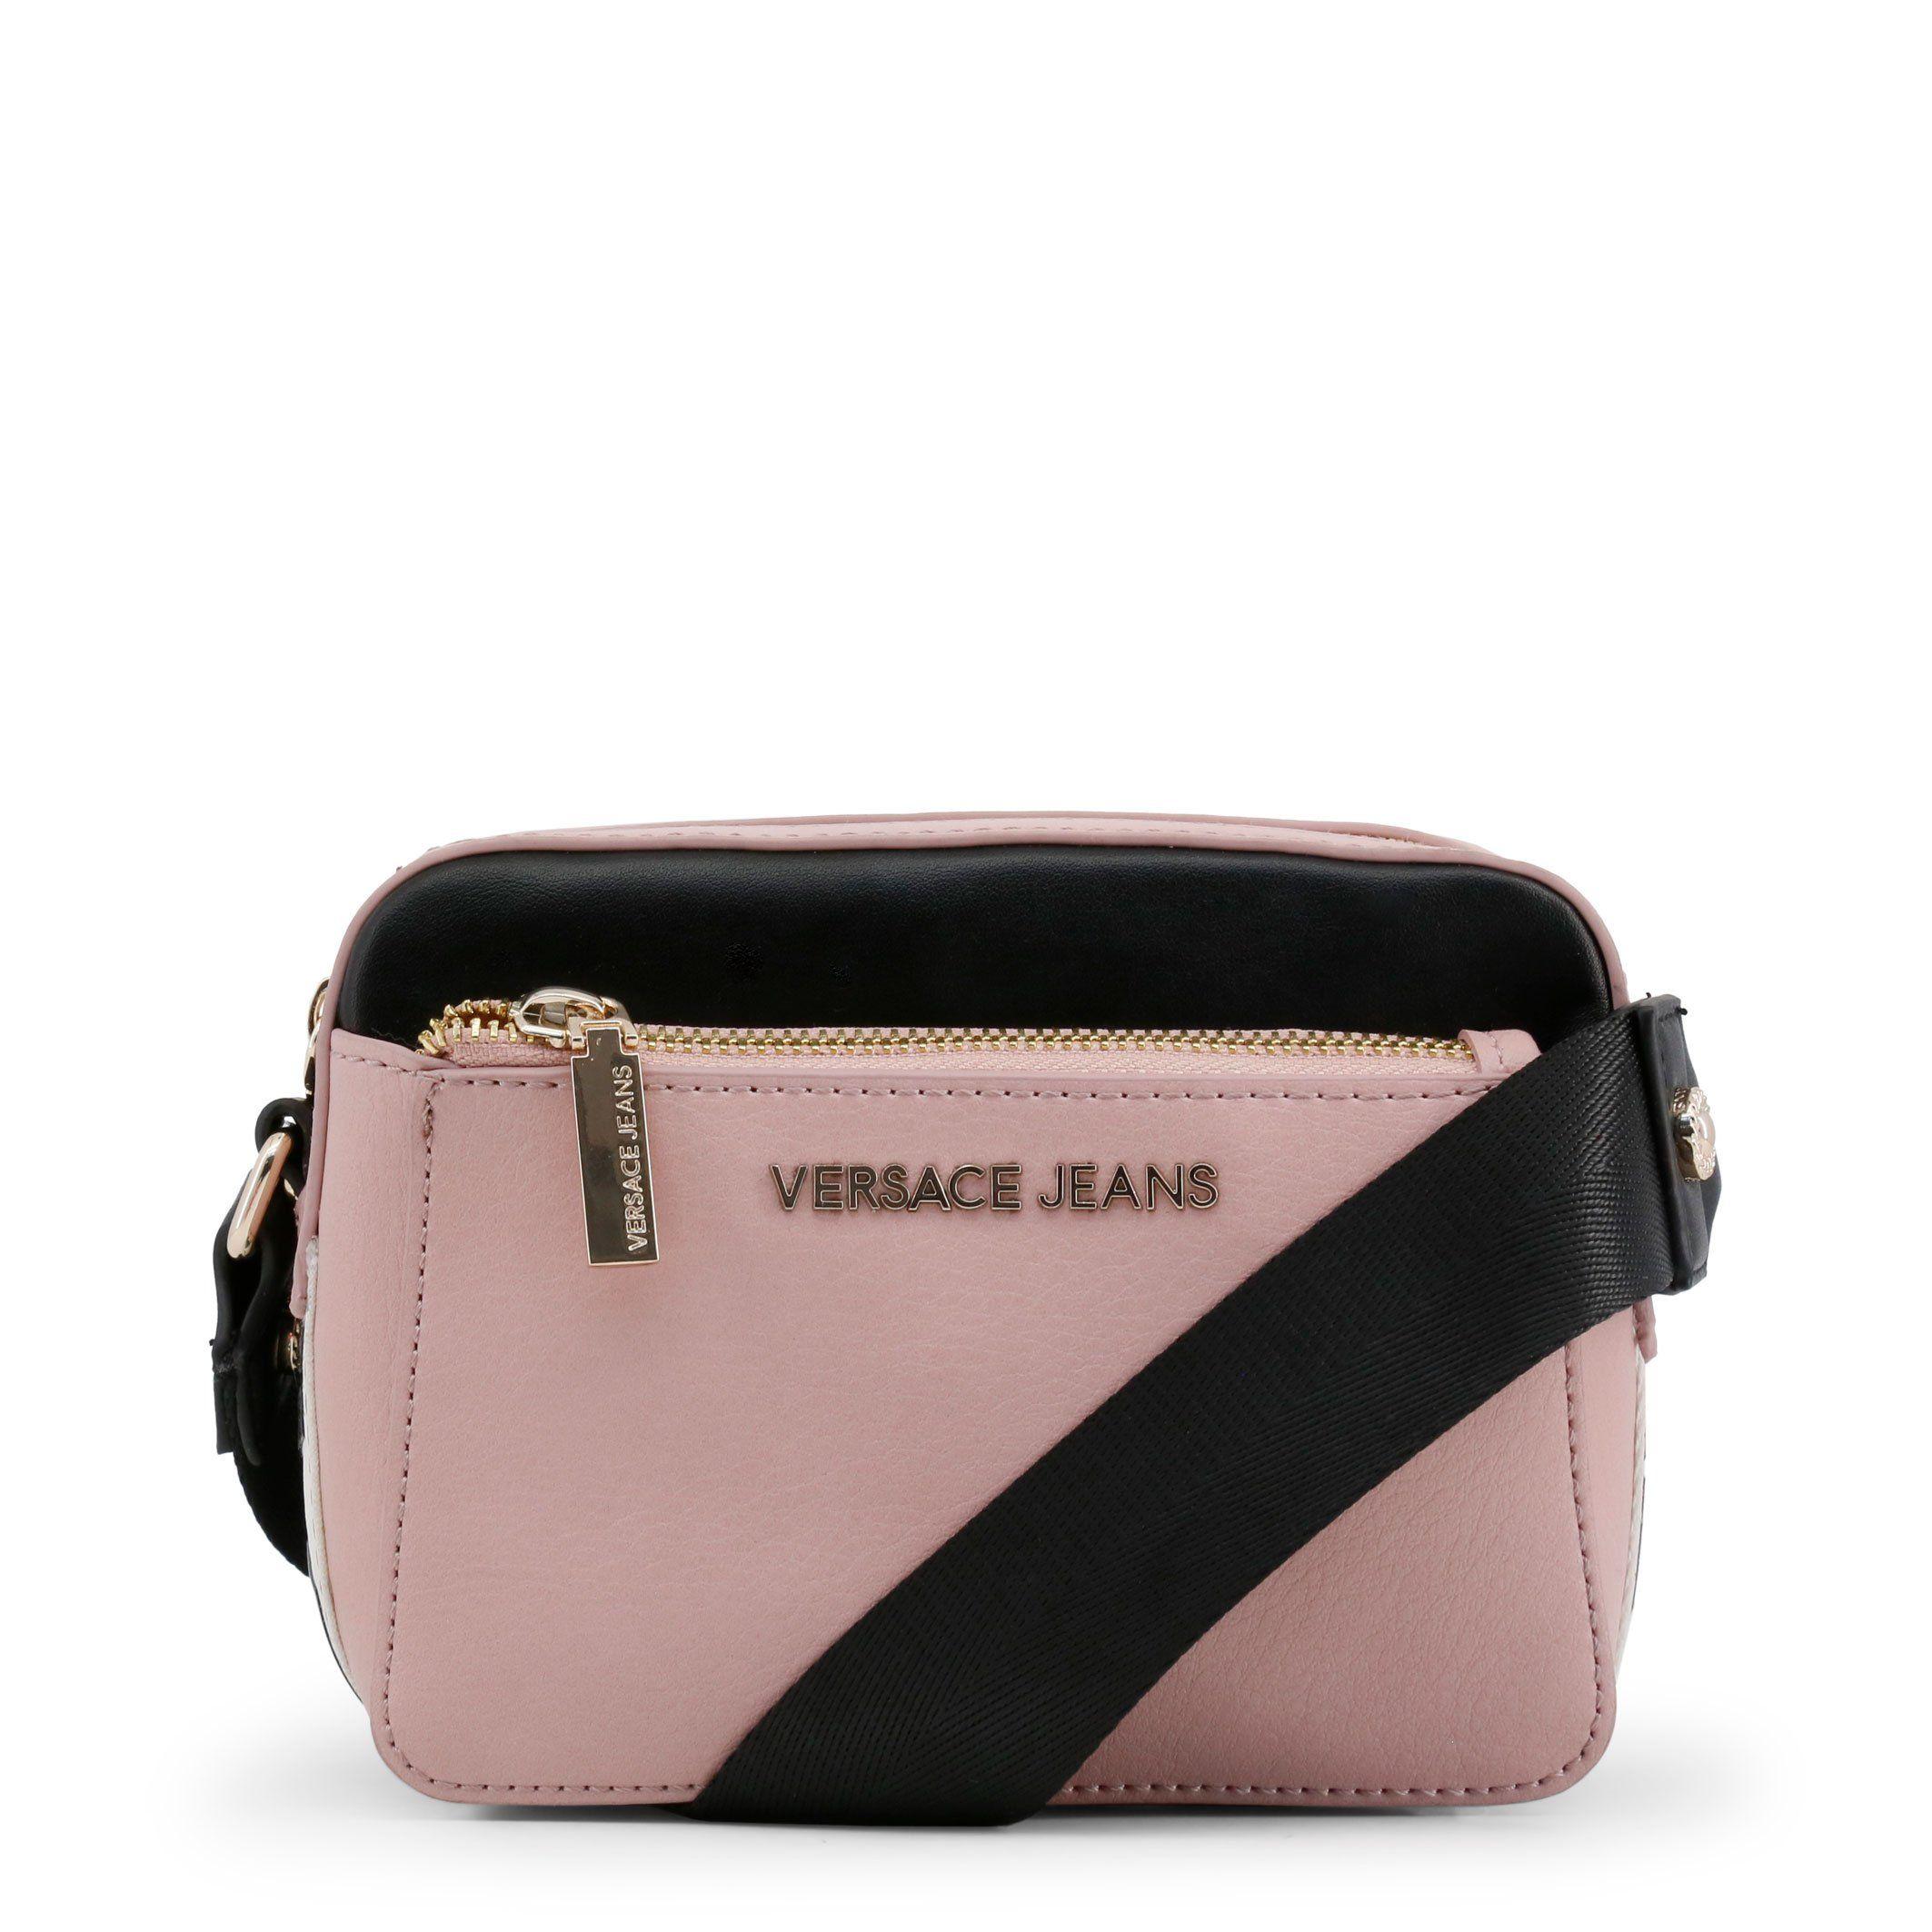 43de2ef2aa Versace Jeans E1VRBBN7 70048